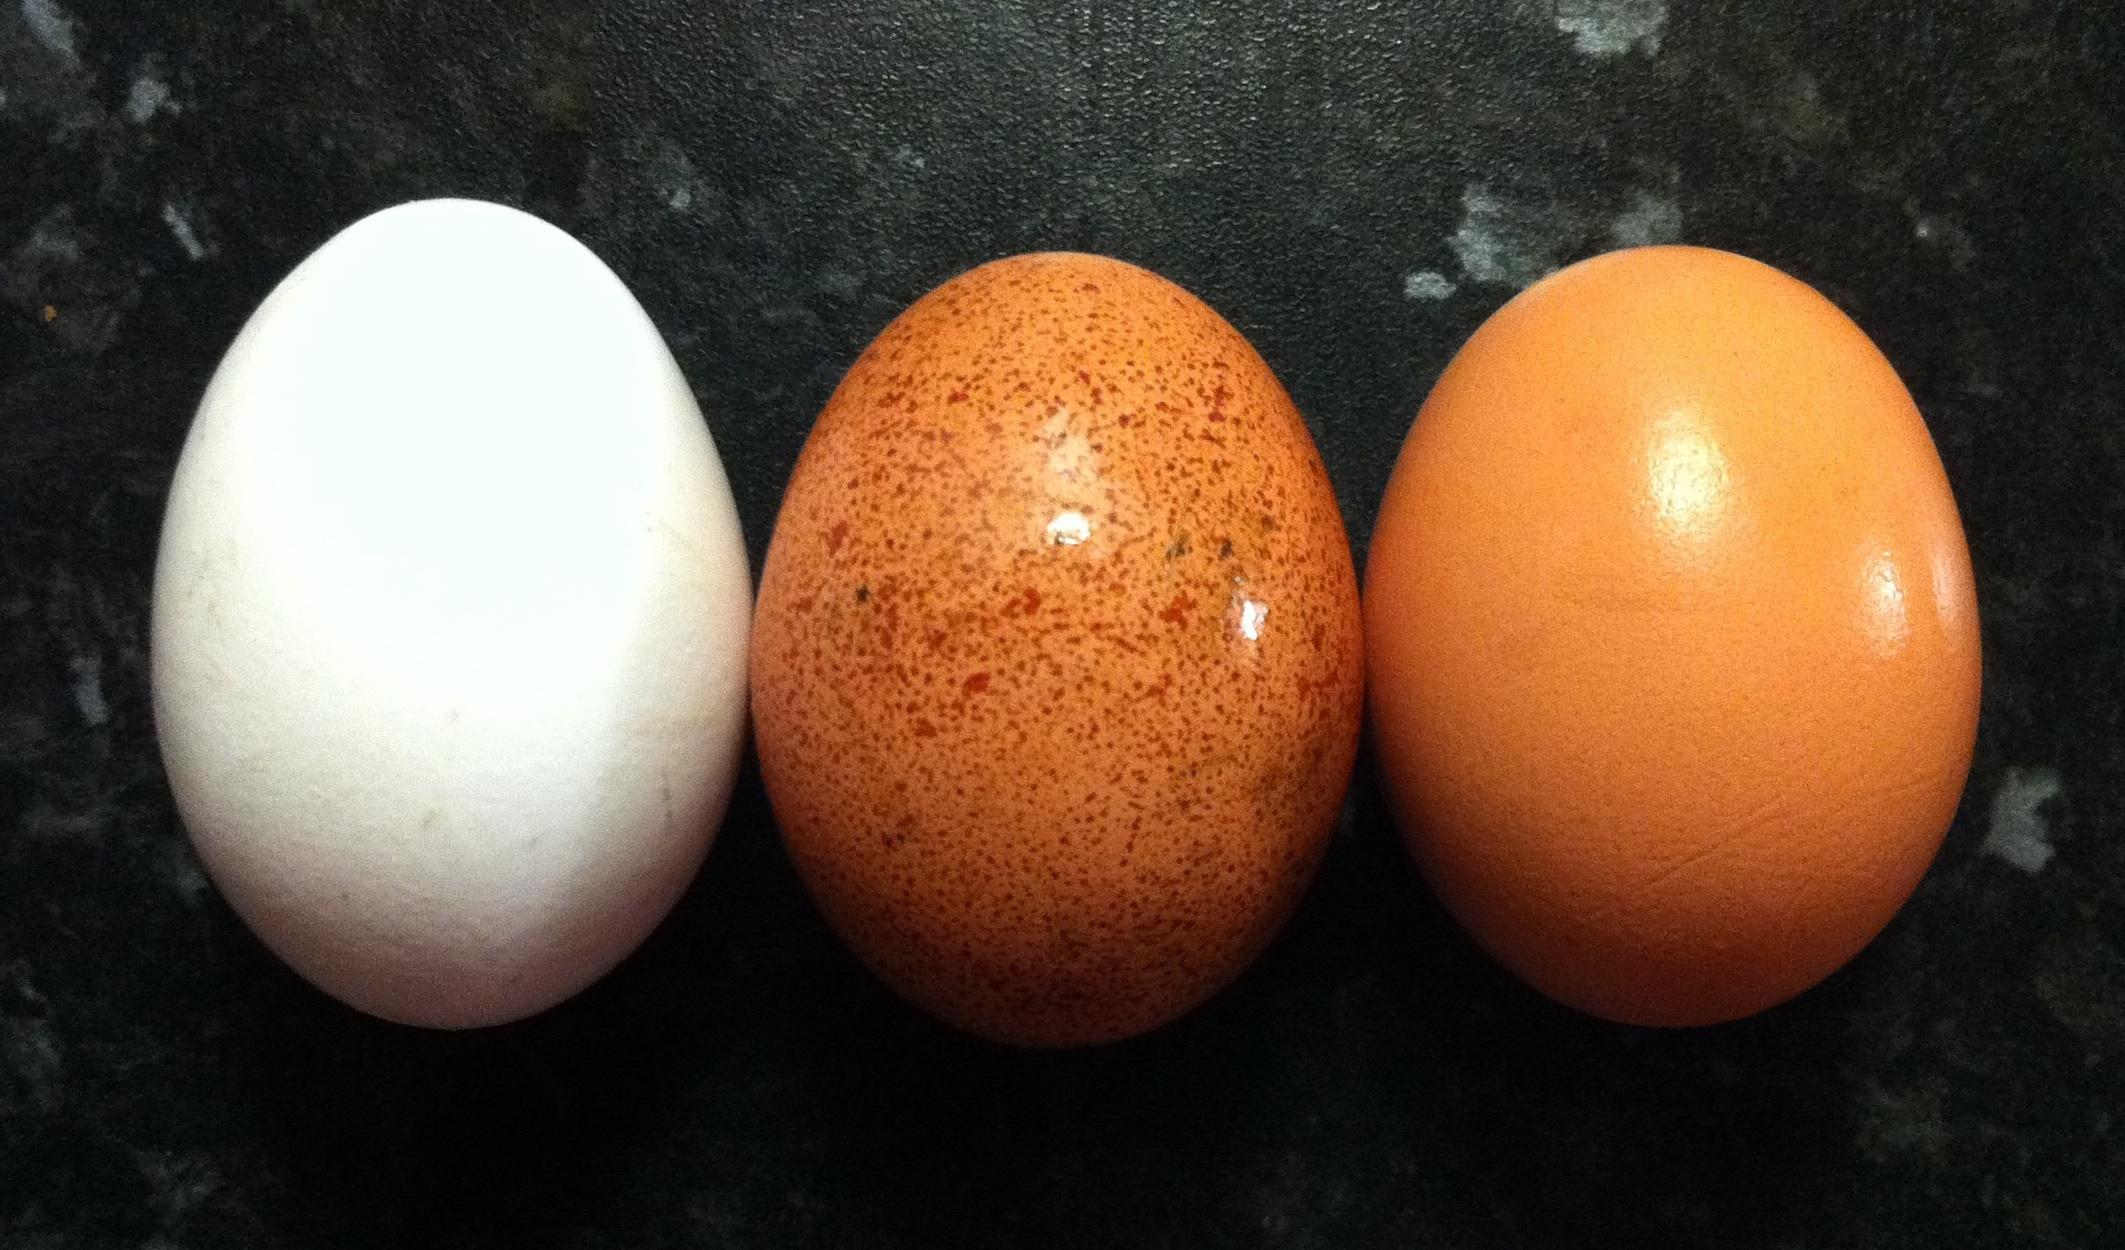 wikipedia - yumurta son kullanma tarihi